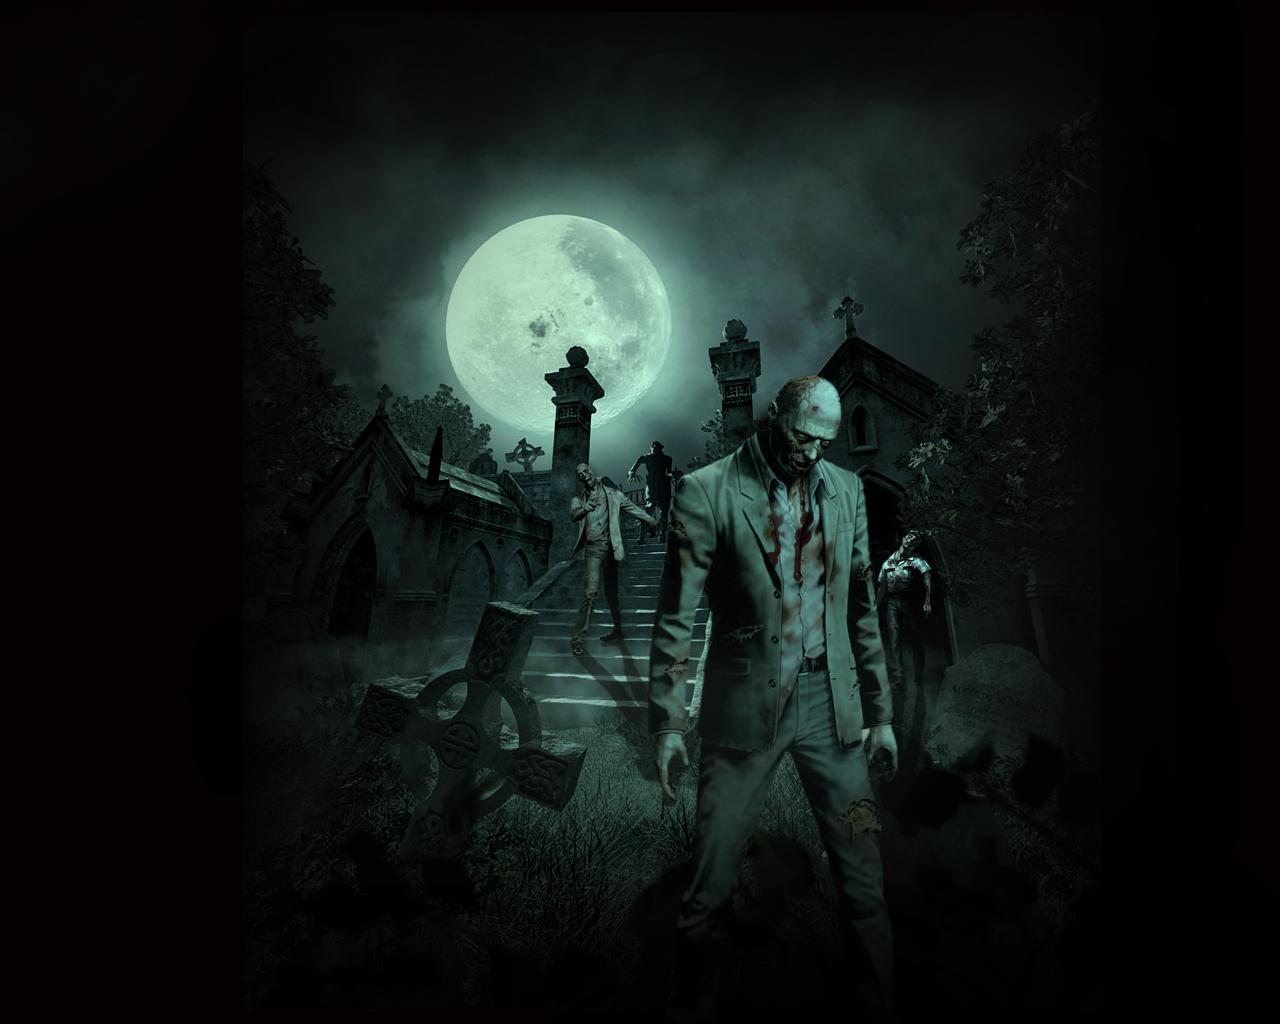 Hd Wallpapers Horror Movies Download Wallpaper DaWallpaperz 1280x1024